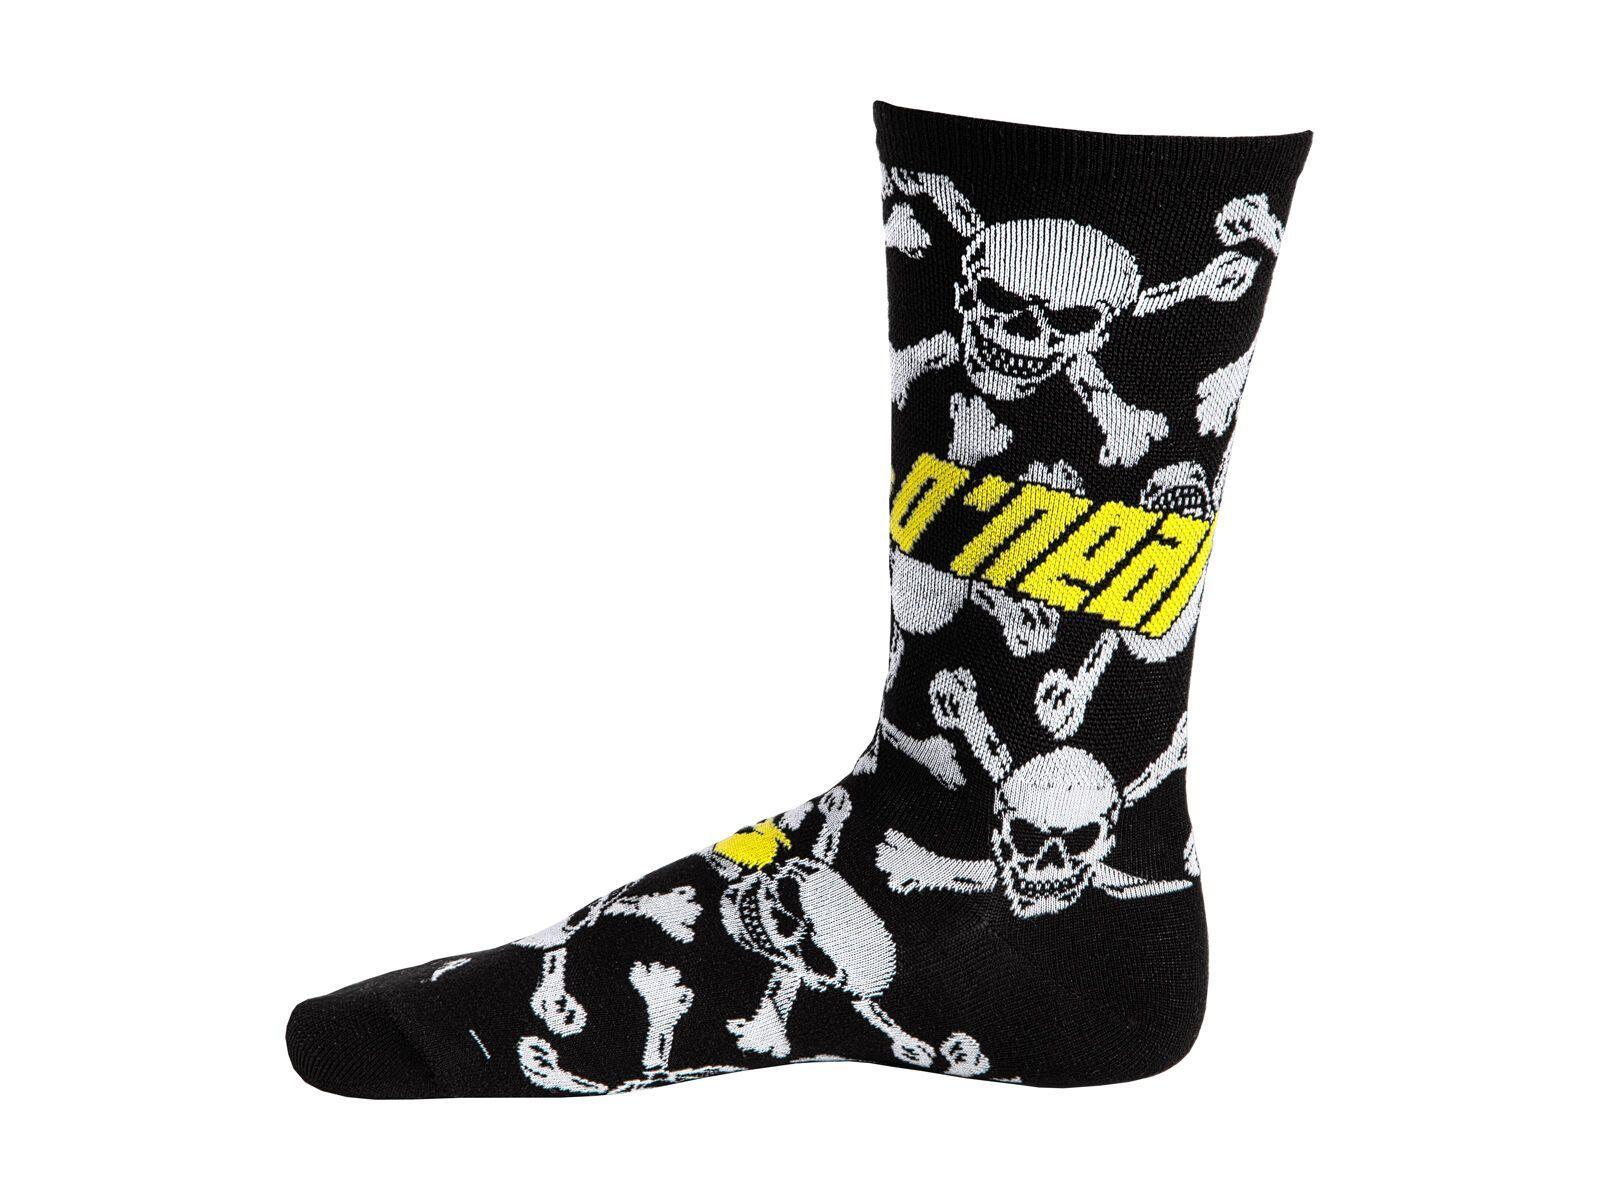 ONeal Crew Socks Crossbone multi 43-46 0356CC-815